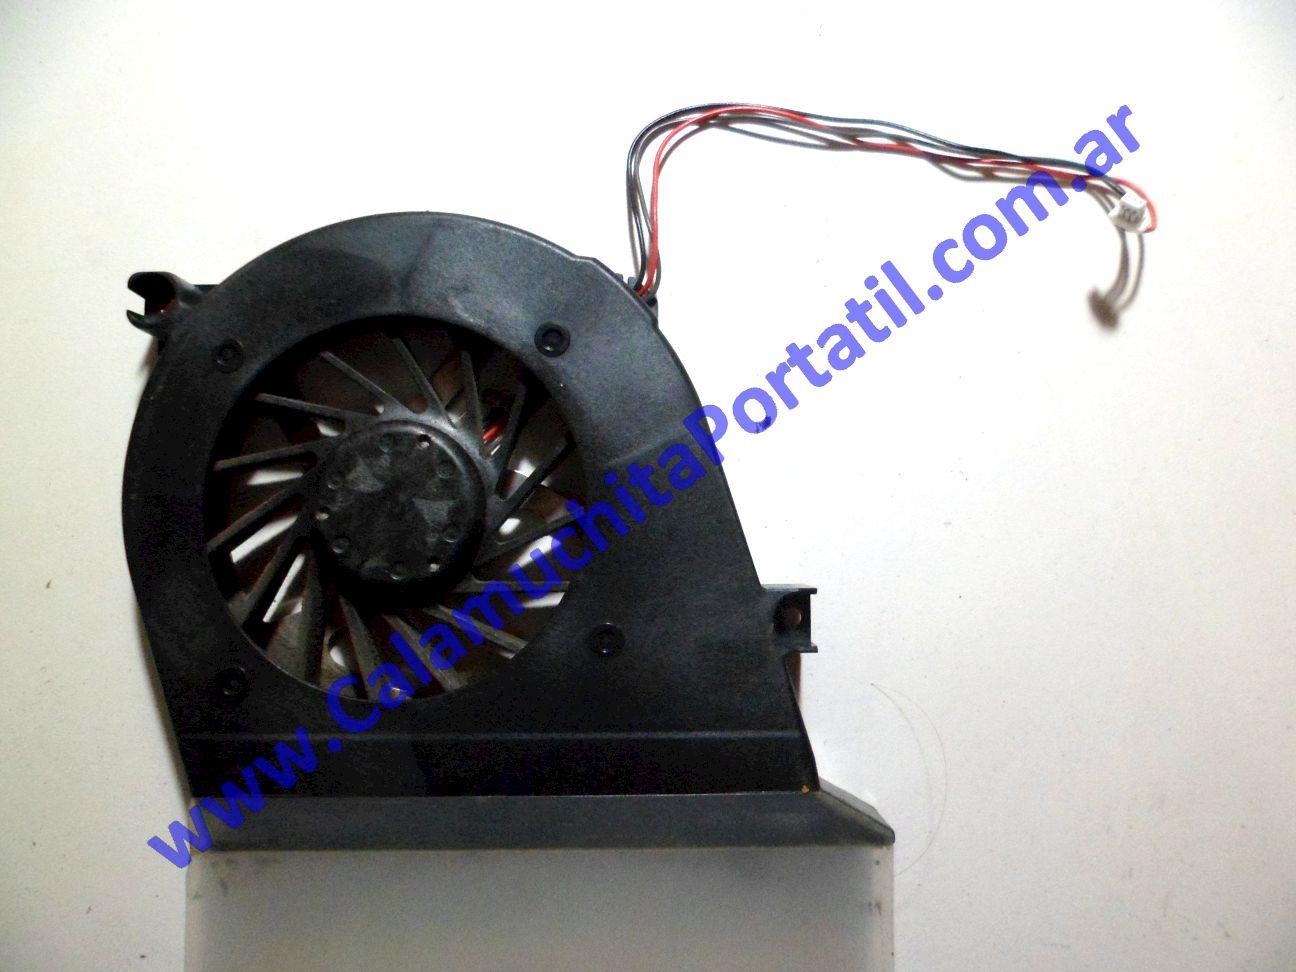 0058VEB Cooler Toshiba Satellite A40-SP151